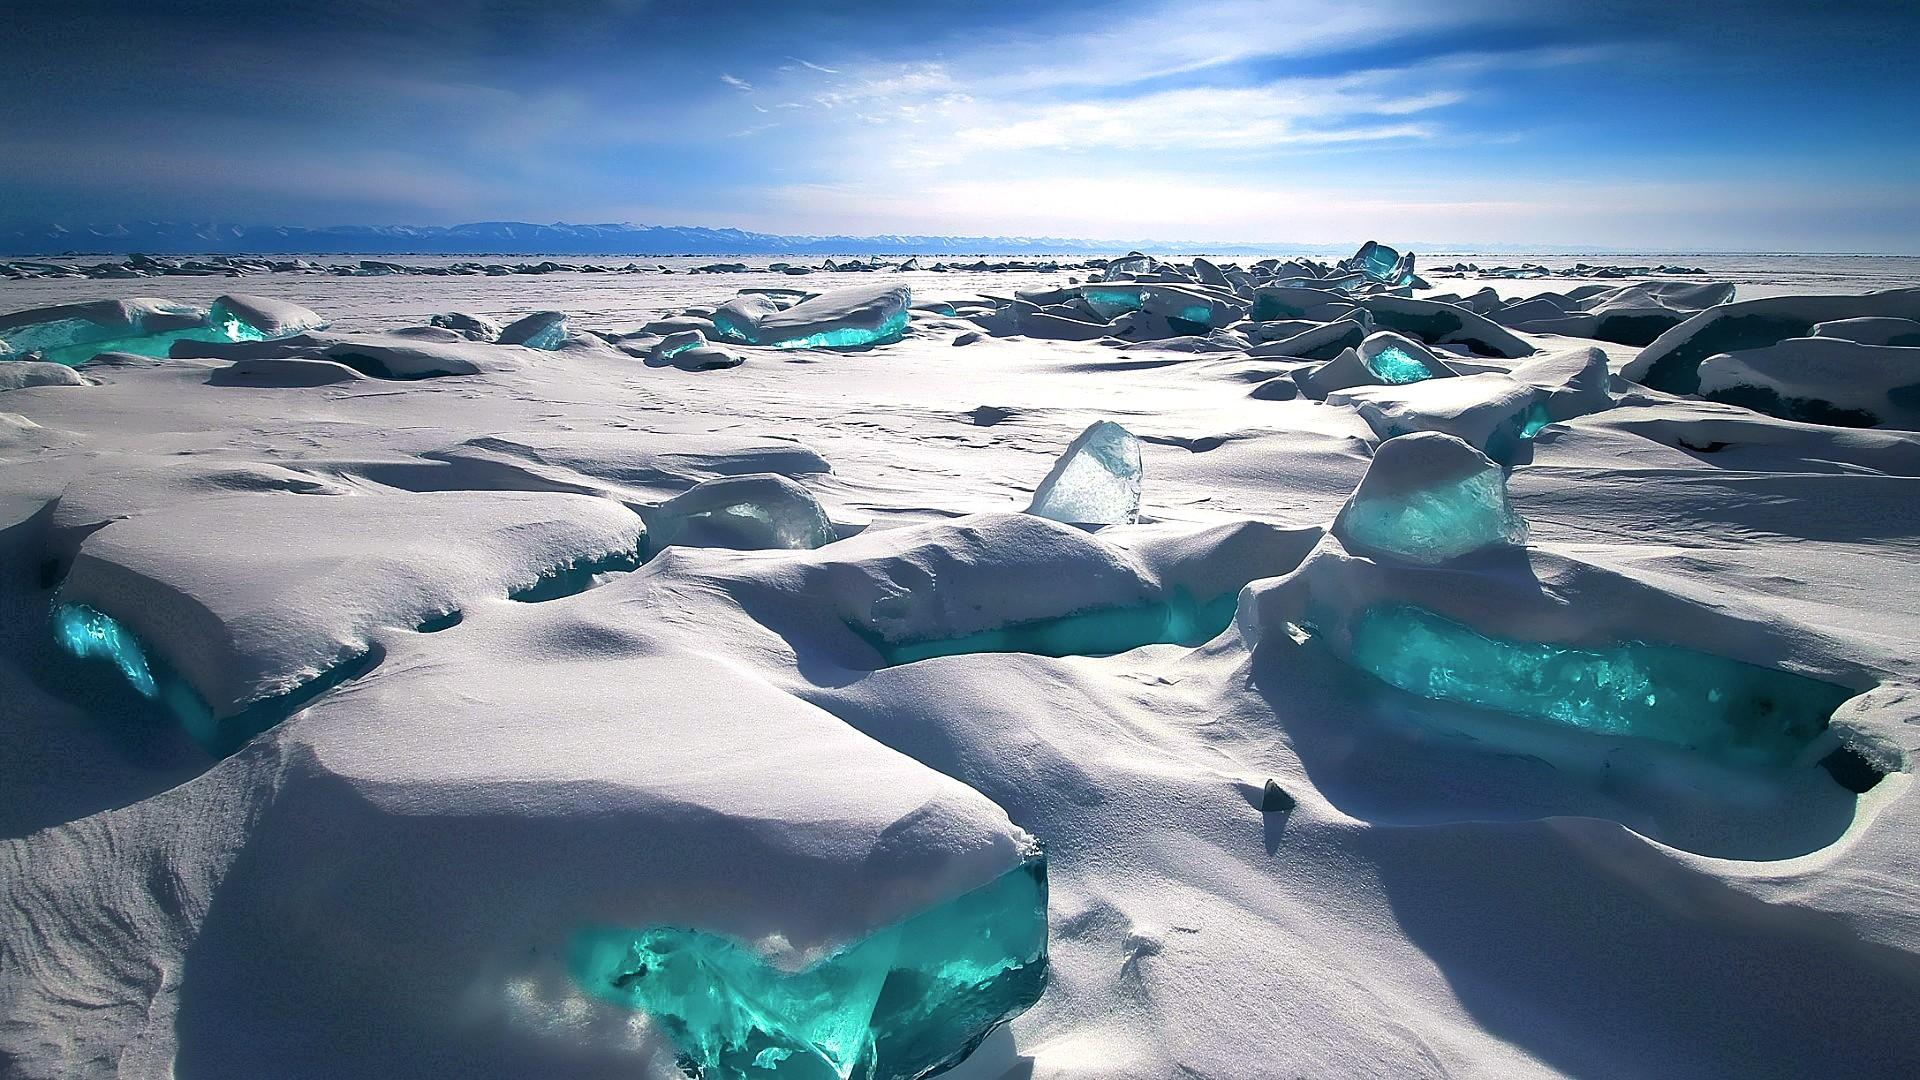 White Sea Snow Iceberg Blue Ice Cold Arctic Freezing Melting Ocean Wave Glacier Wind